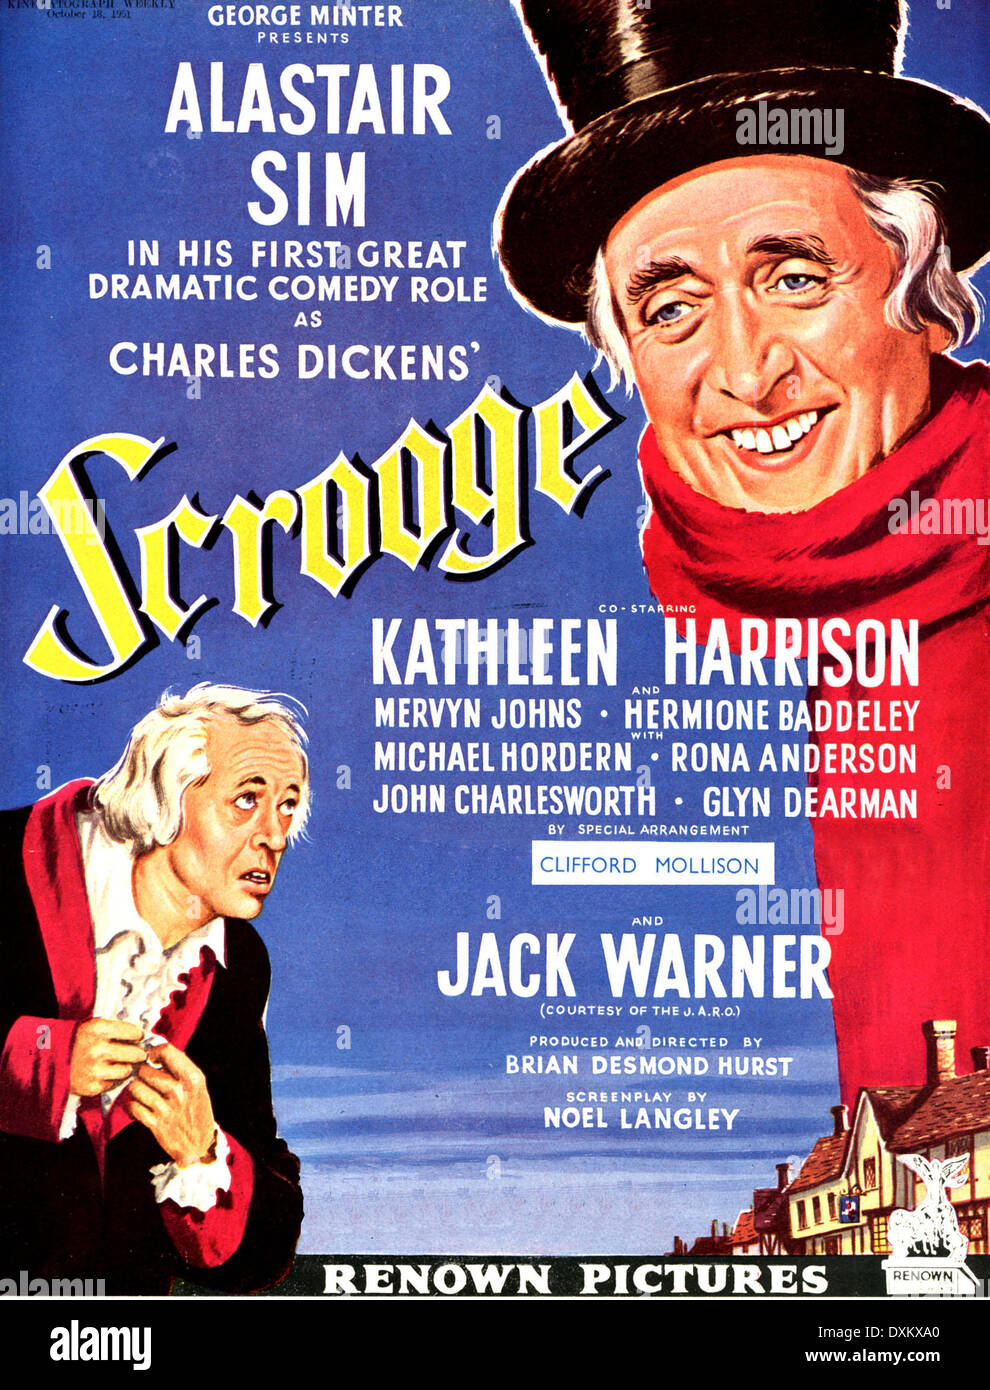 Scrooge Film Stockfotos & Scrooge Film Bilder - Alamy